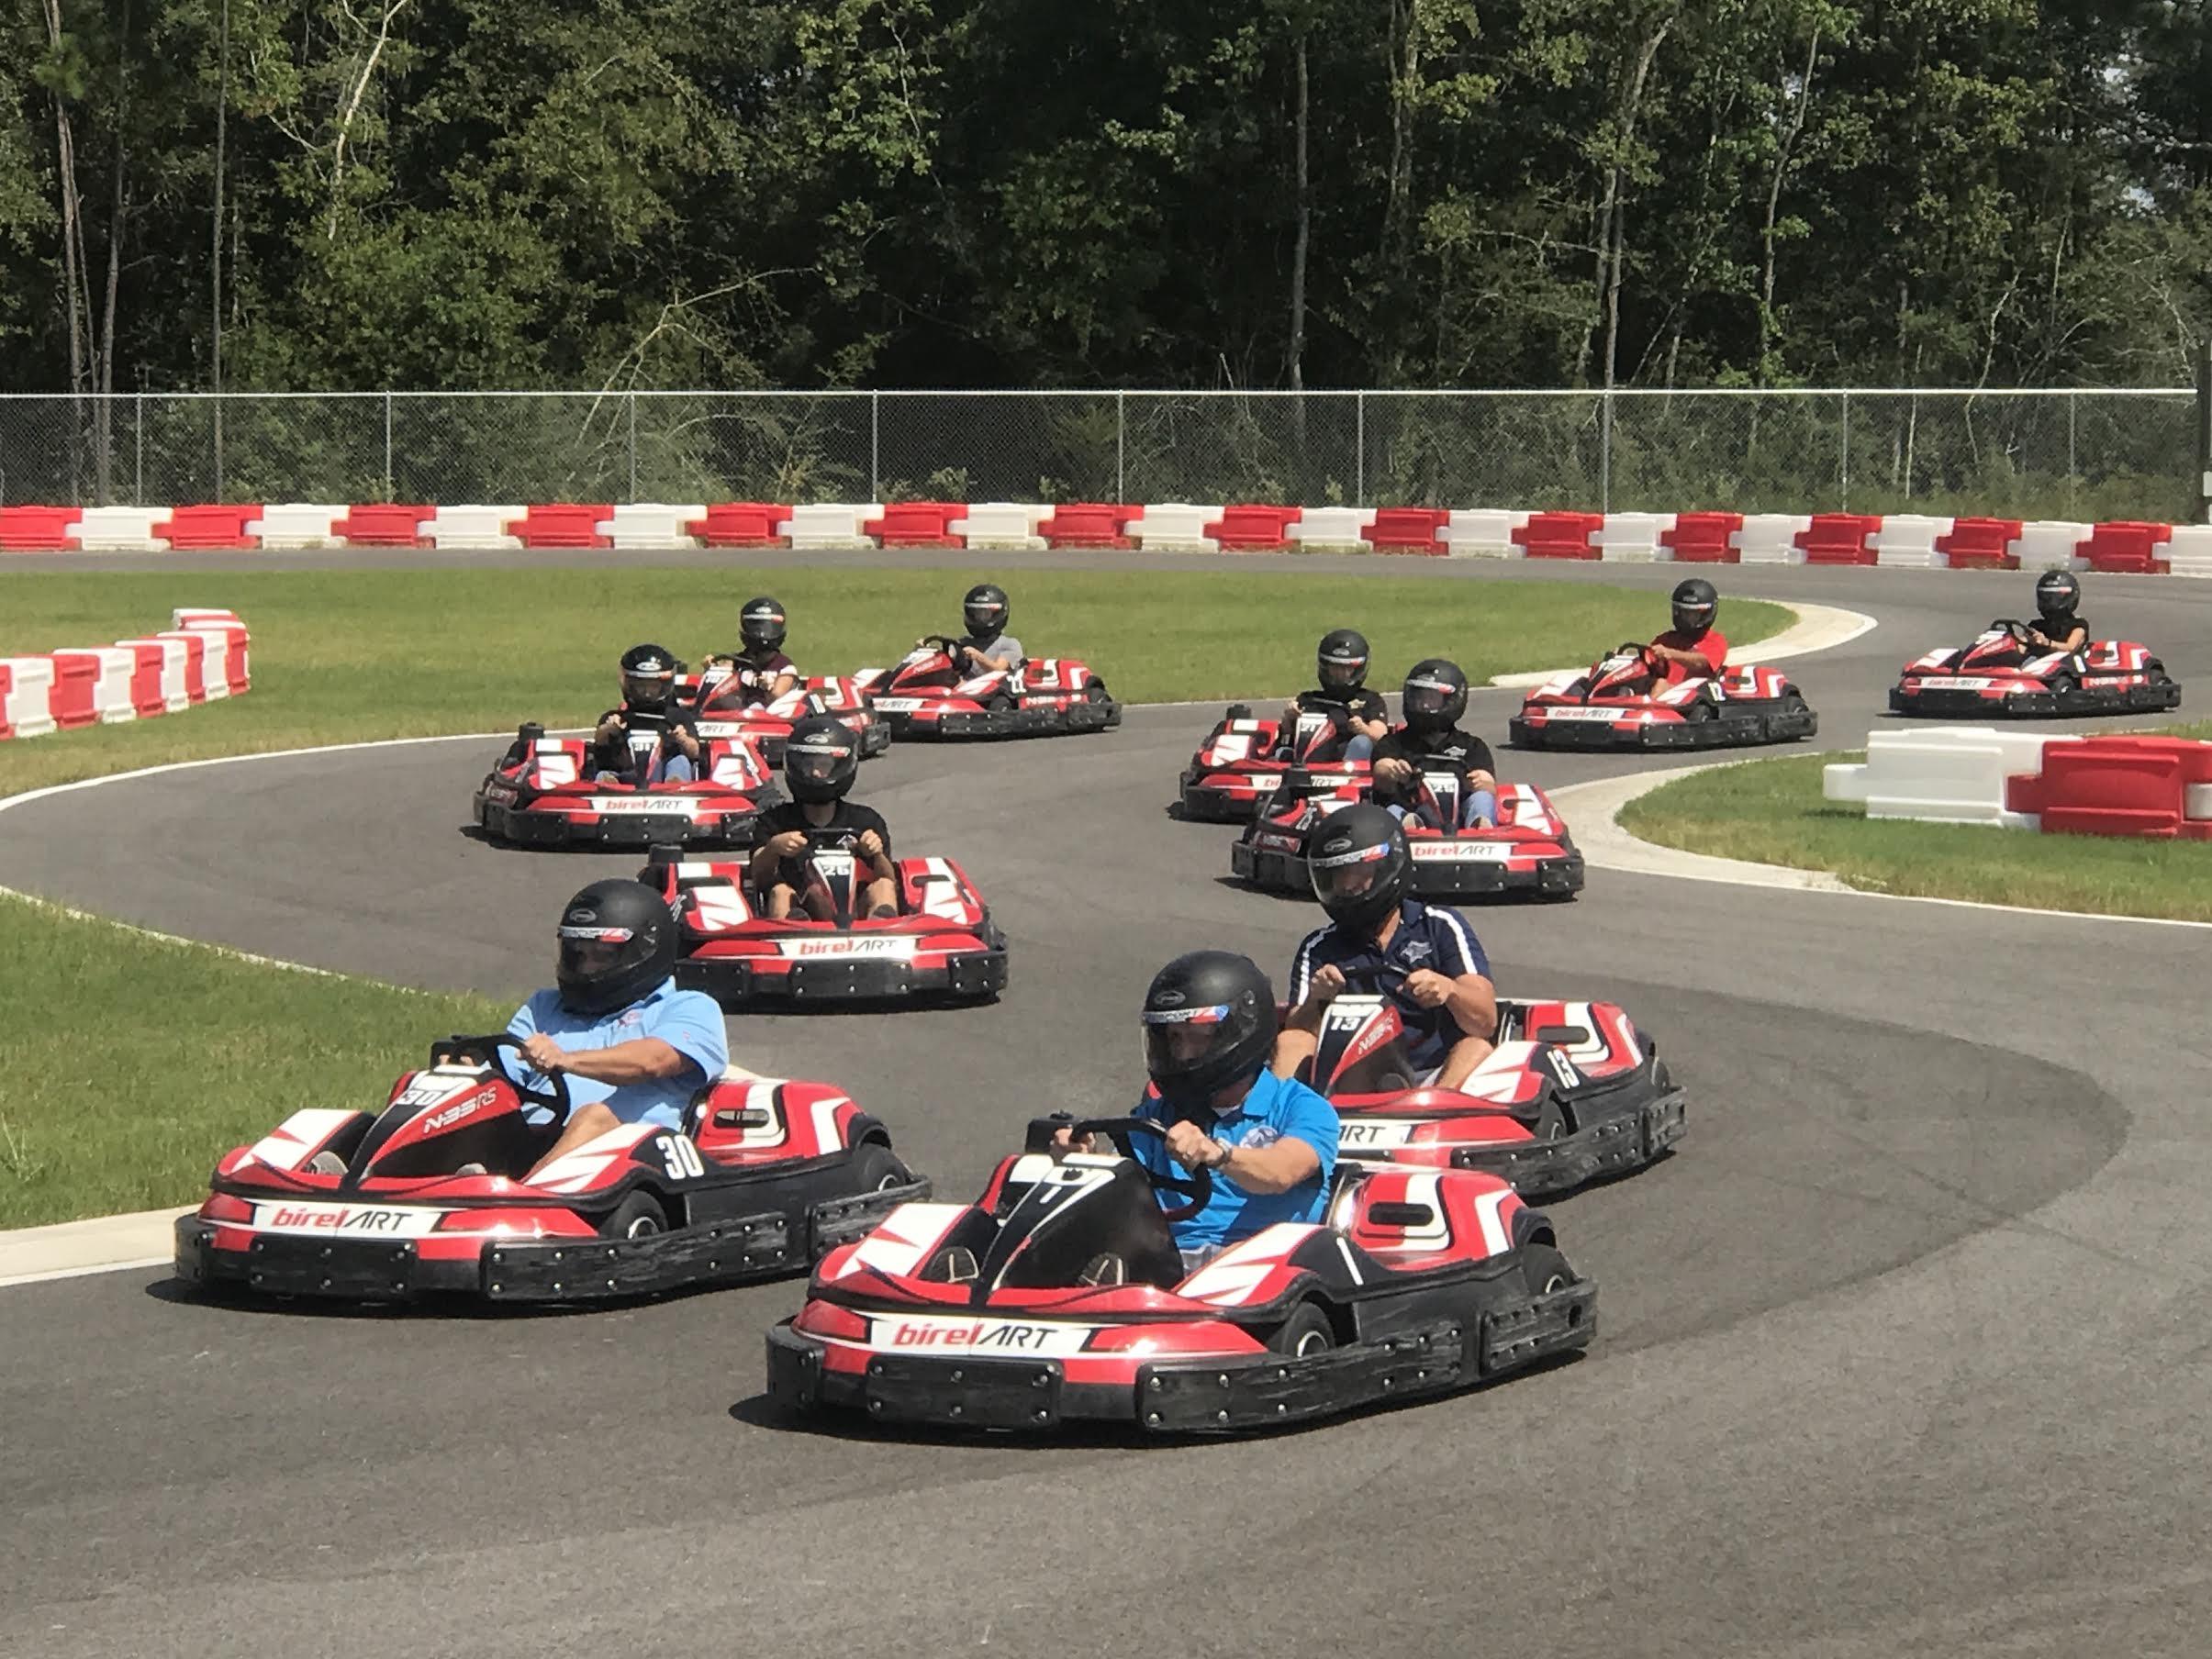 Go Kart Racing Houston >> Outdoor Go-Karts Around Houston: The Ultimate Adrenaline ...